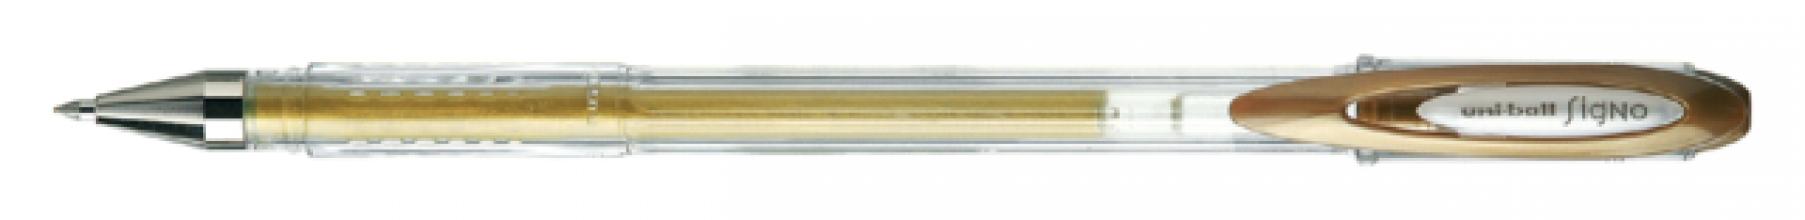 , Rollerpen Uni-ball Signo Metallises goud